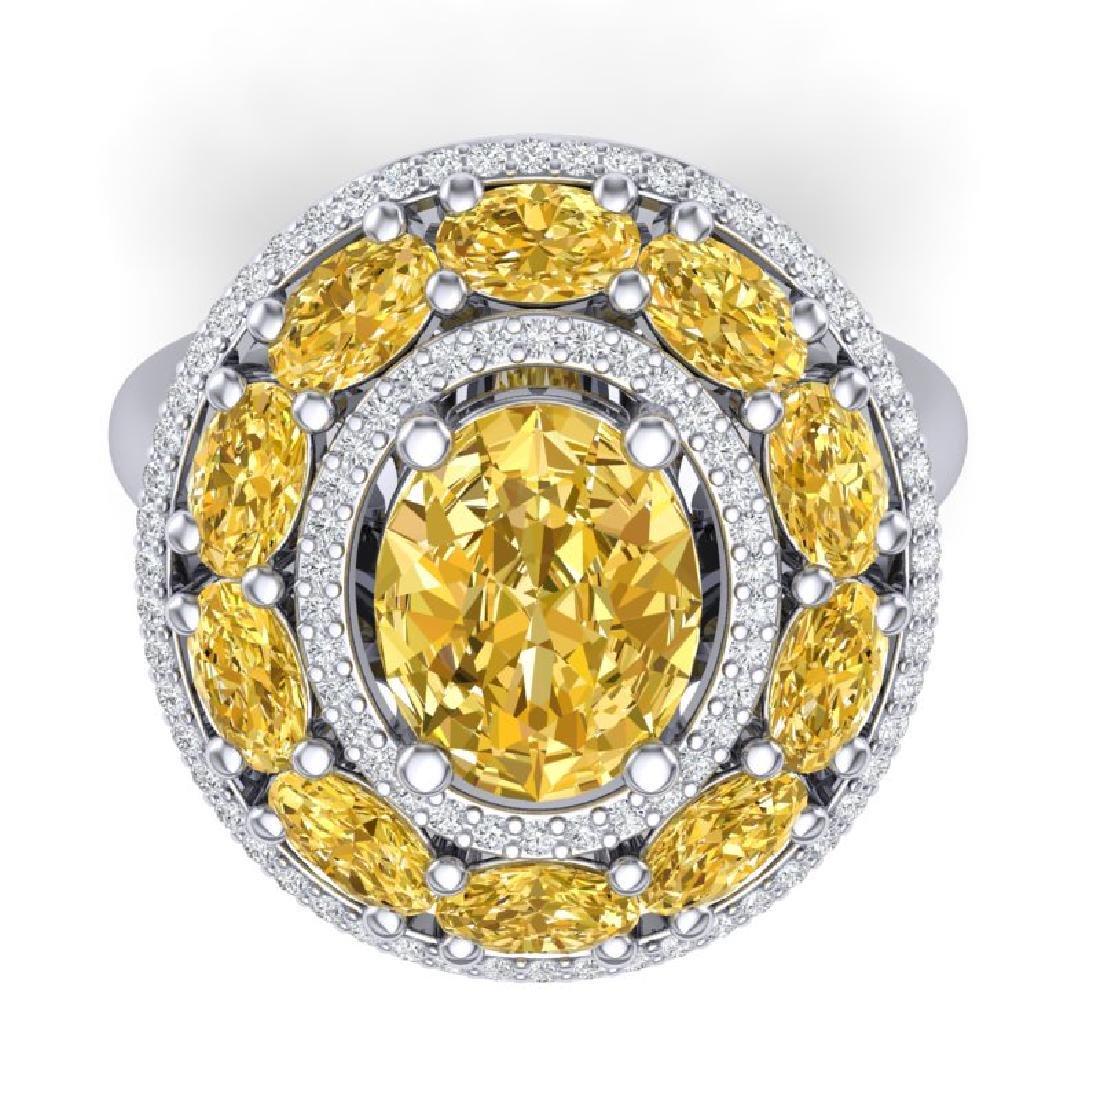 7.21 CTW Royalty Canary Citrine & VS Diamond Ring 18K - 2